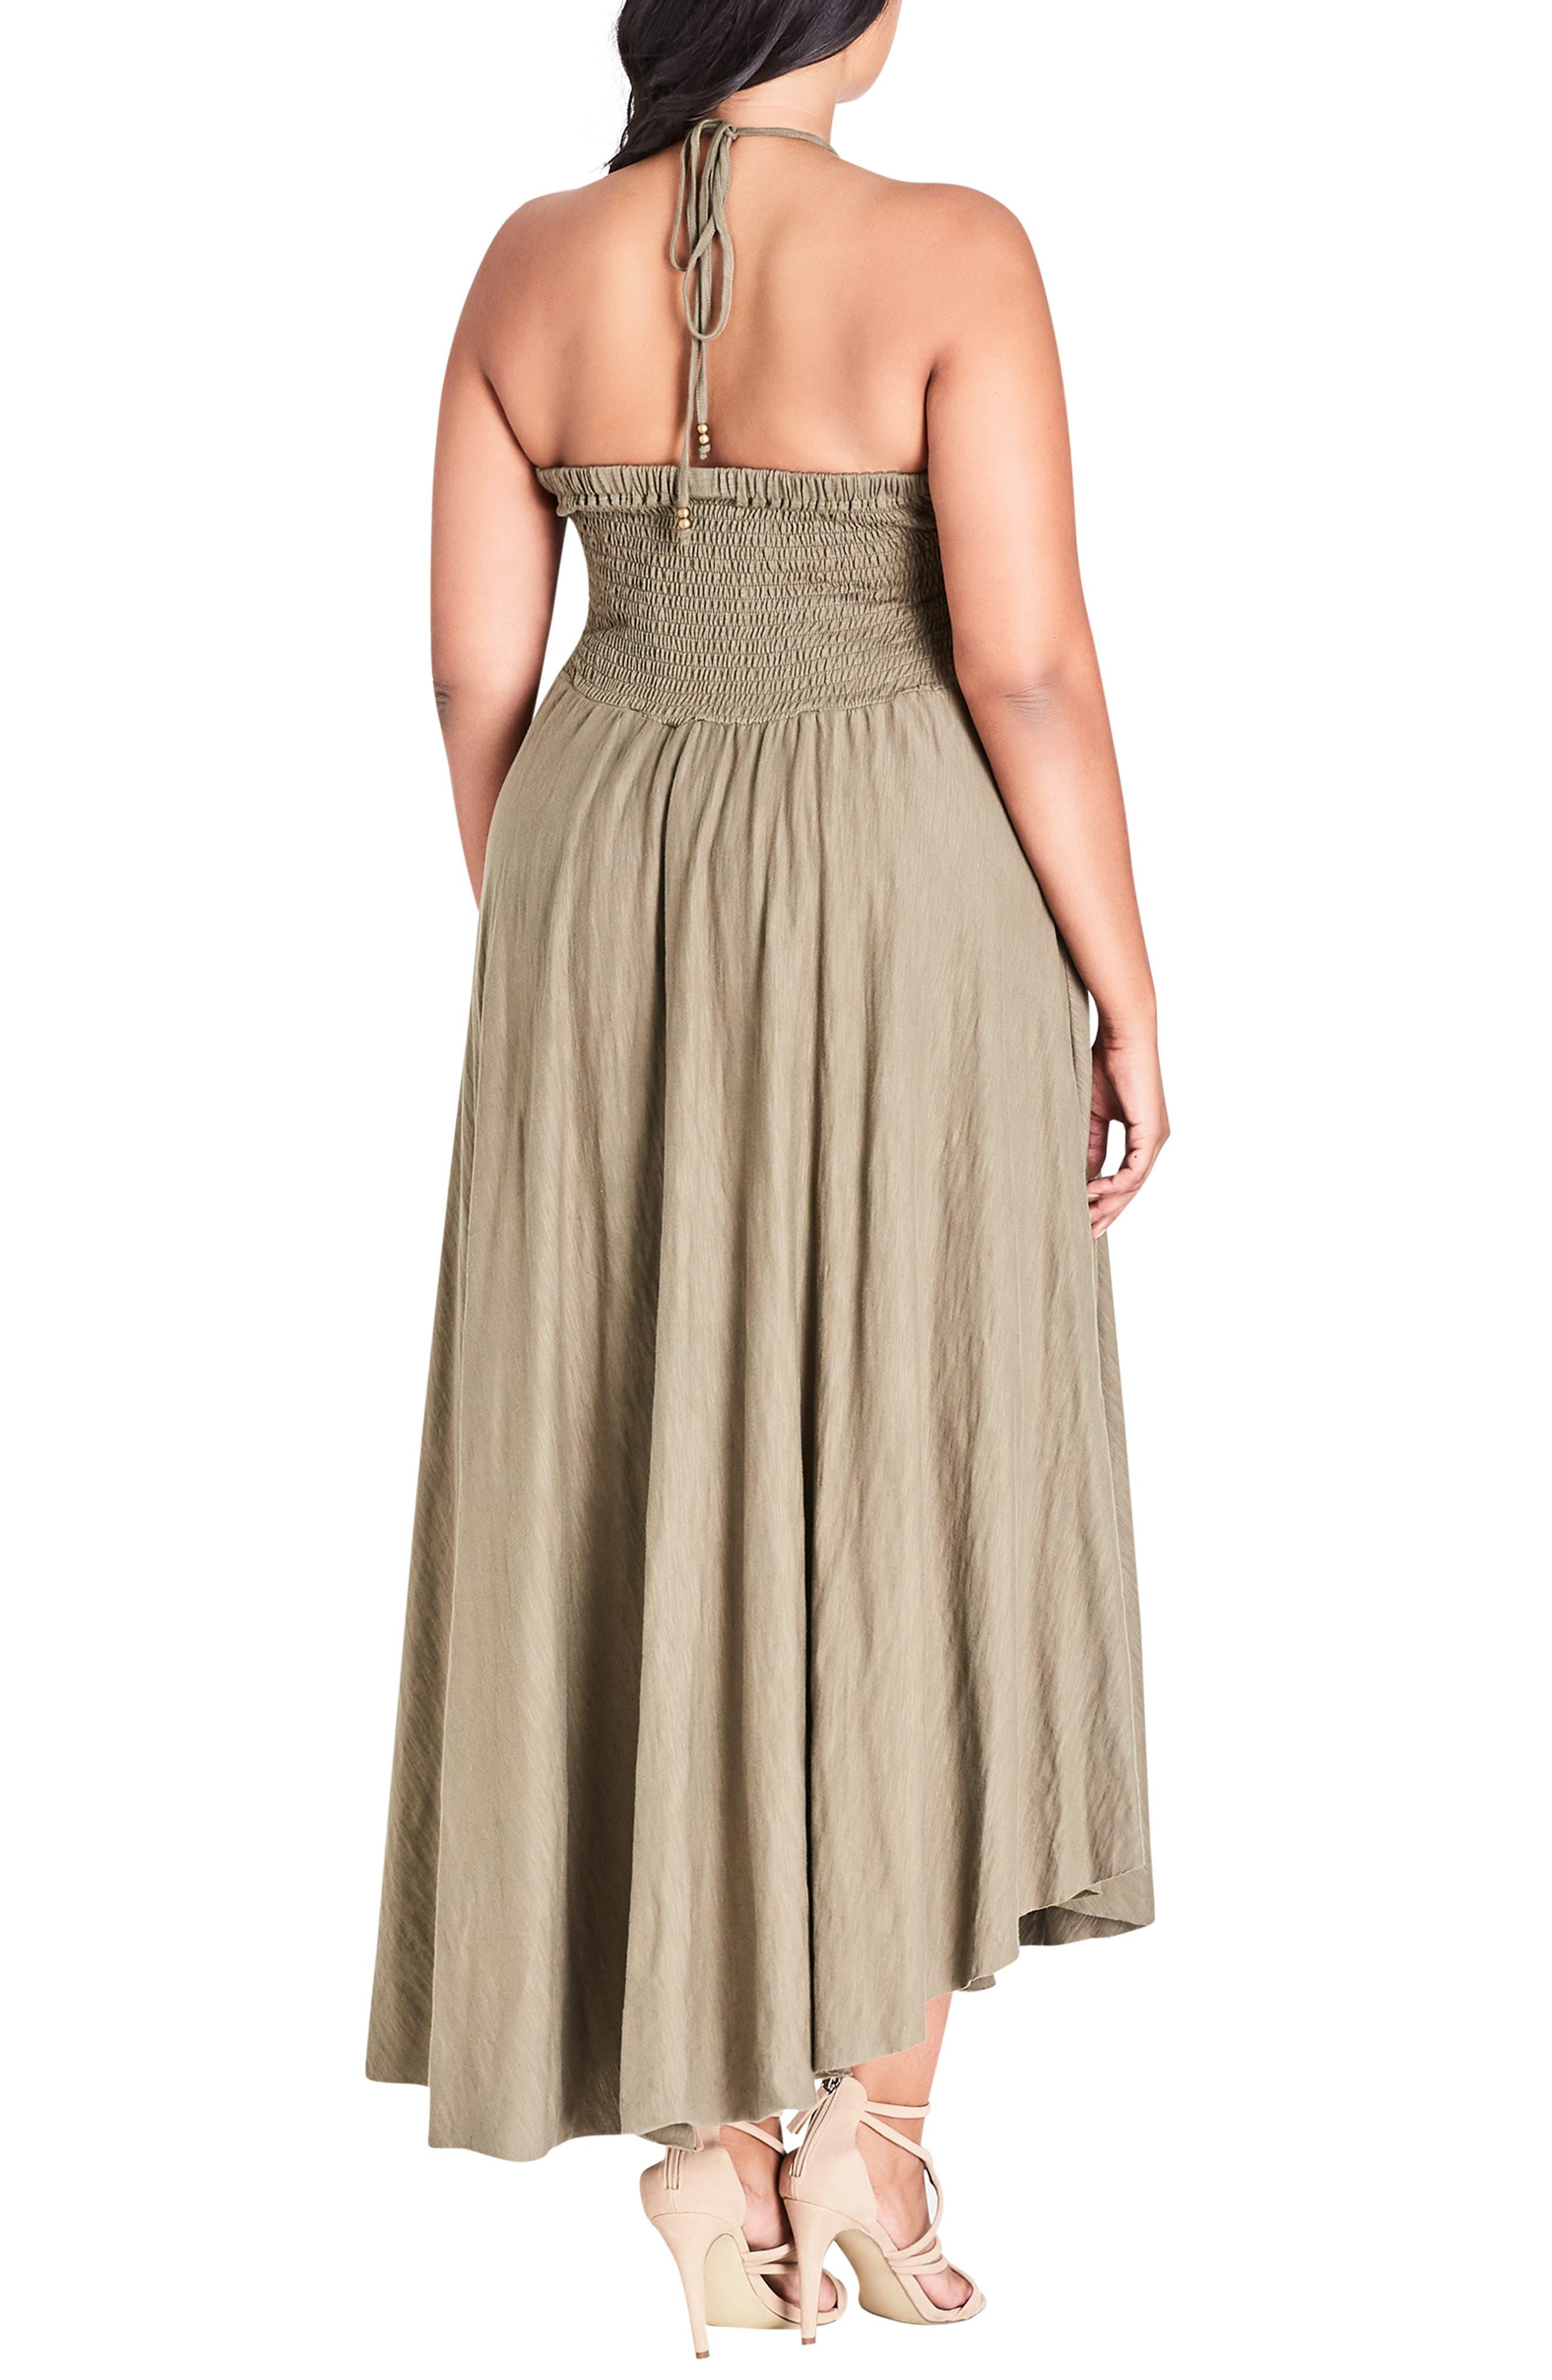 CITY CHIC, Strappy Asymmetrical Faux Wrap Halter Maxi Dress, Alternate thumbnail 2, color, KHAKI